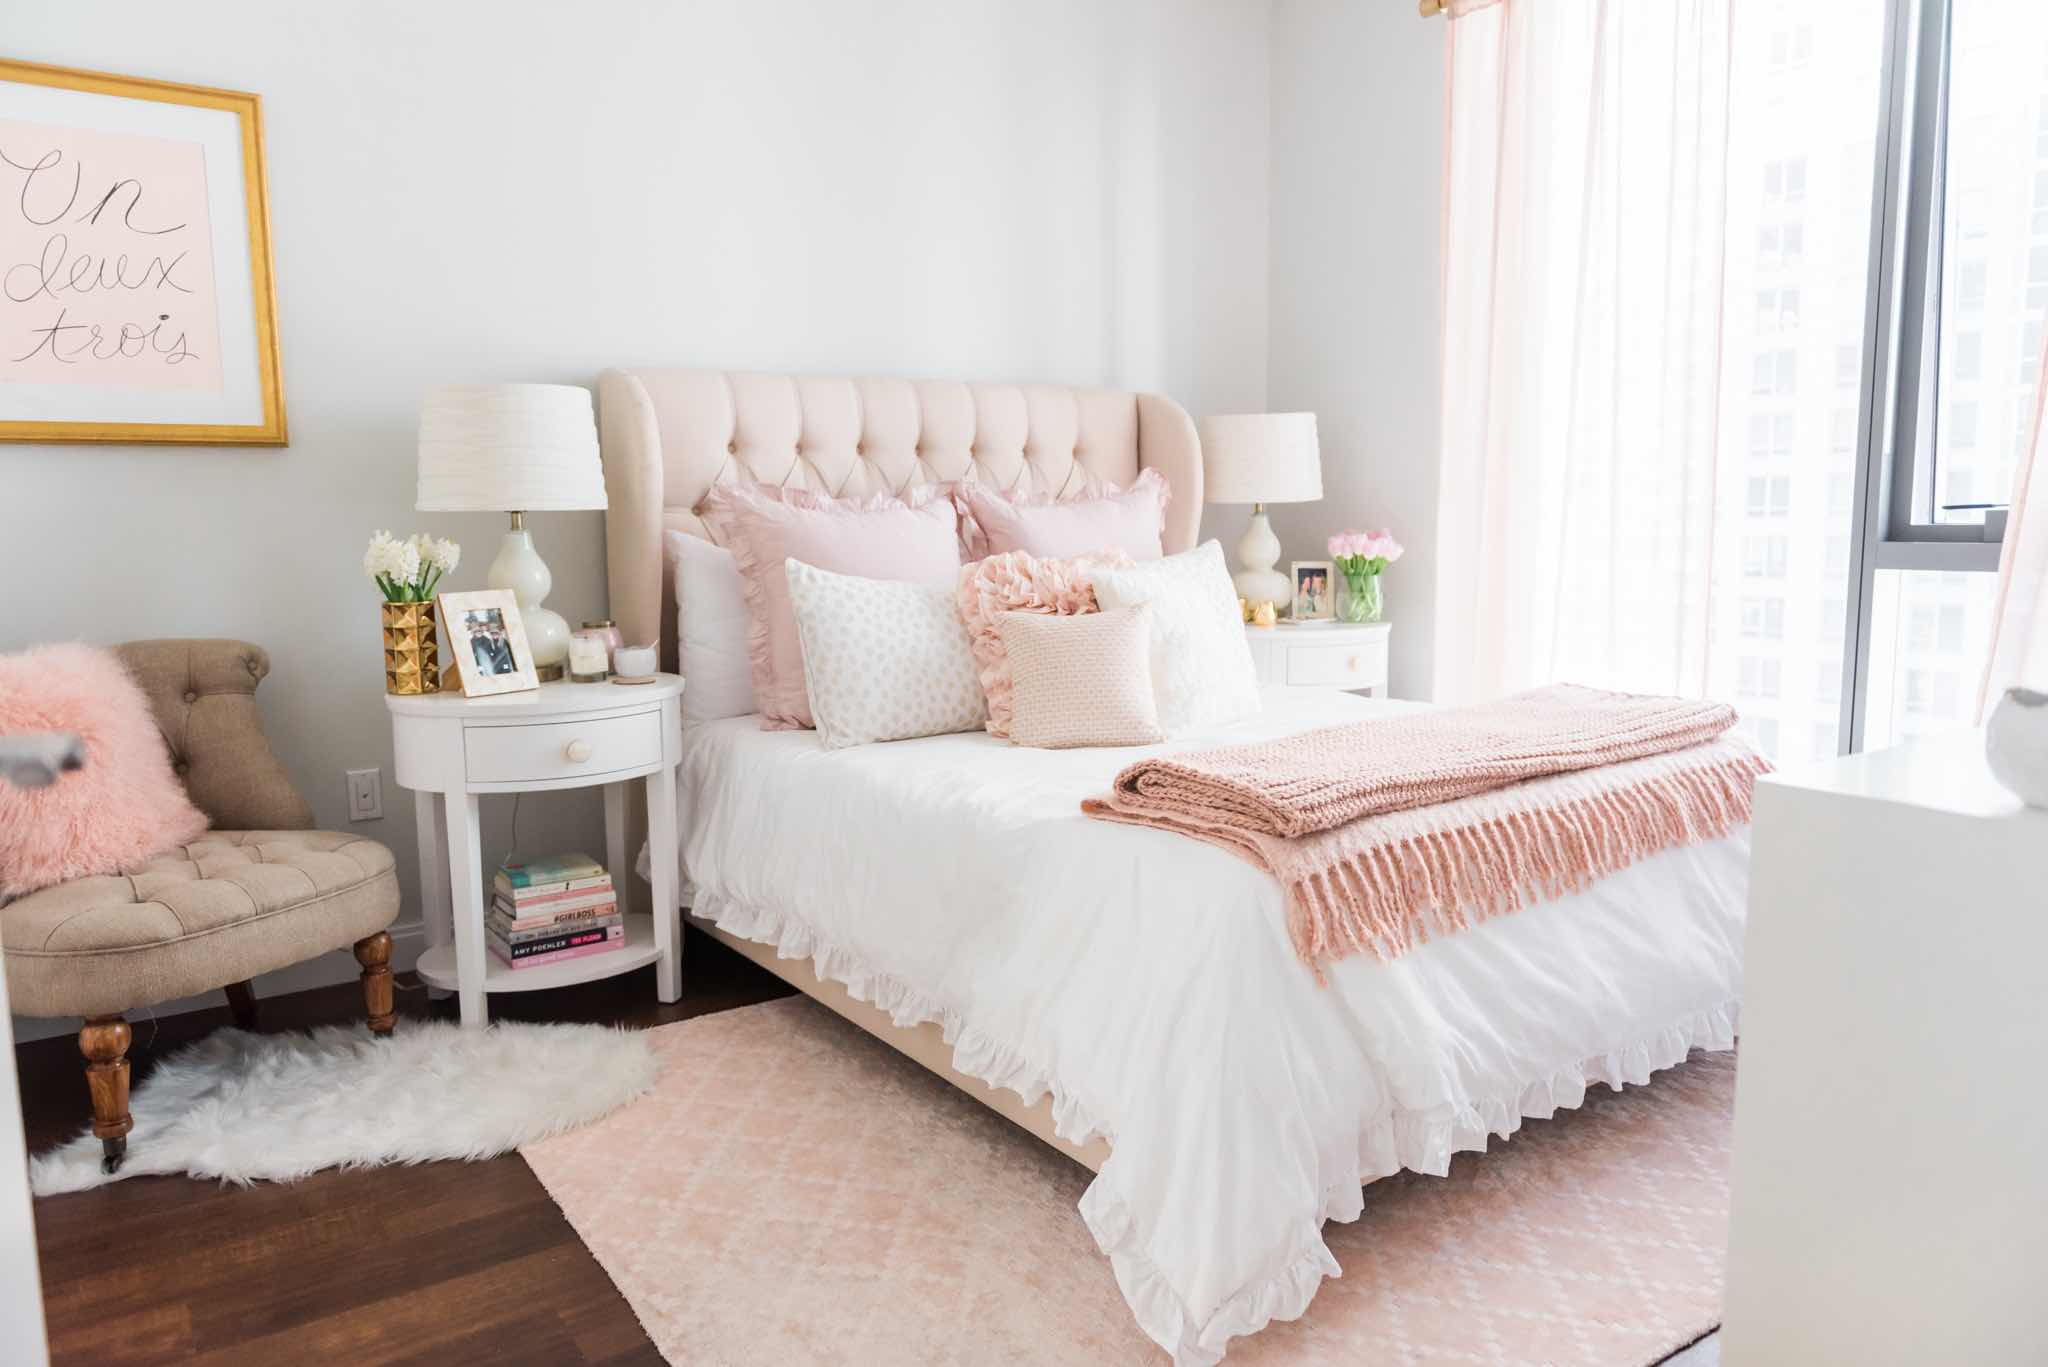 Design Story: A Soft, Sweet U0026 Blush Worthy Bedroom